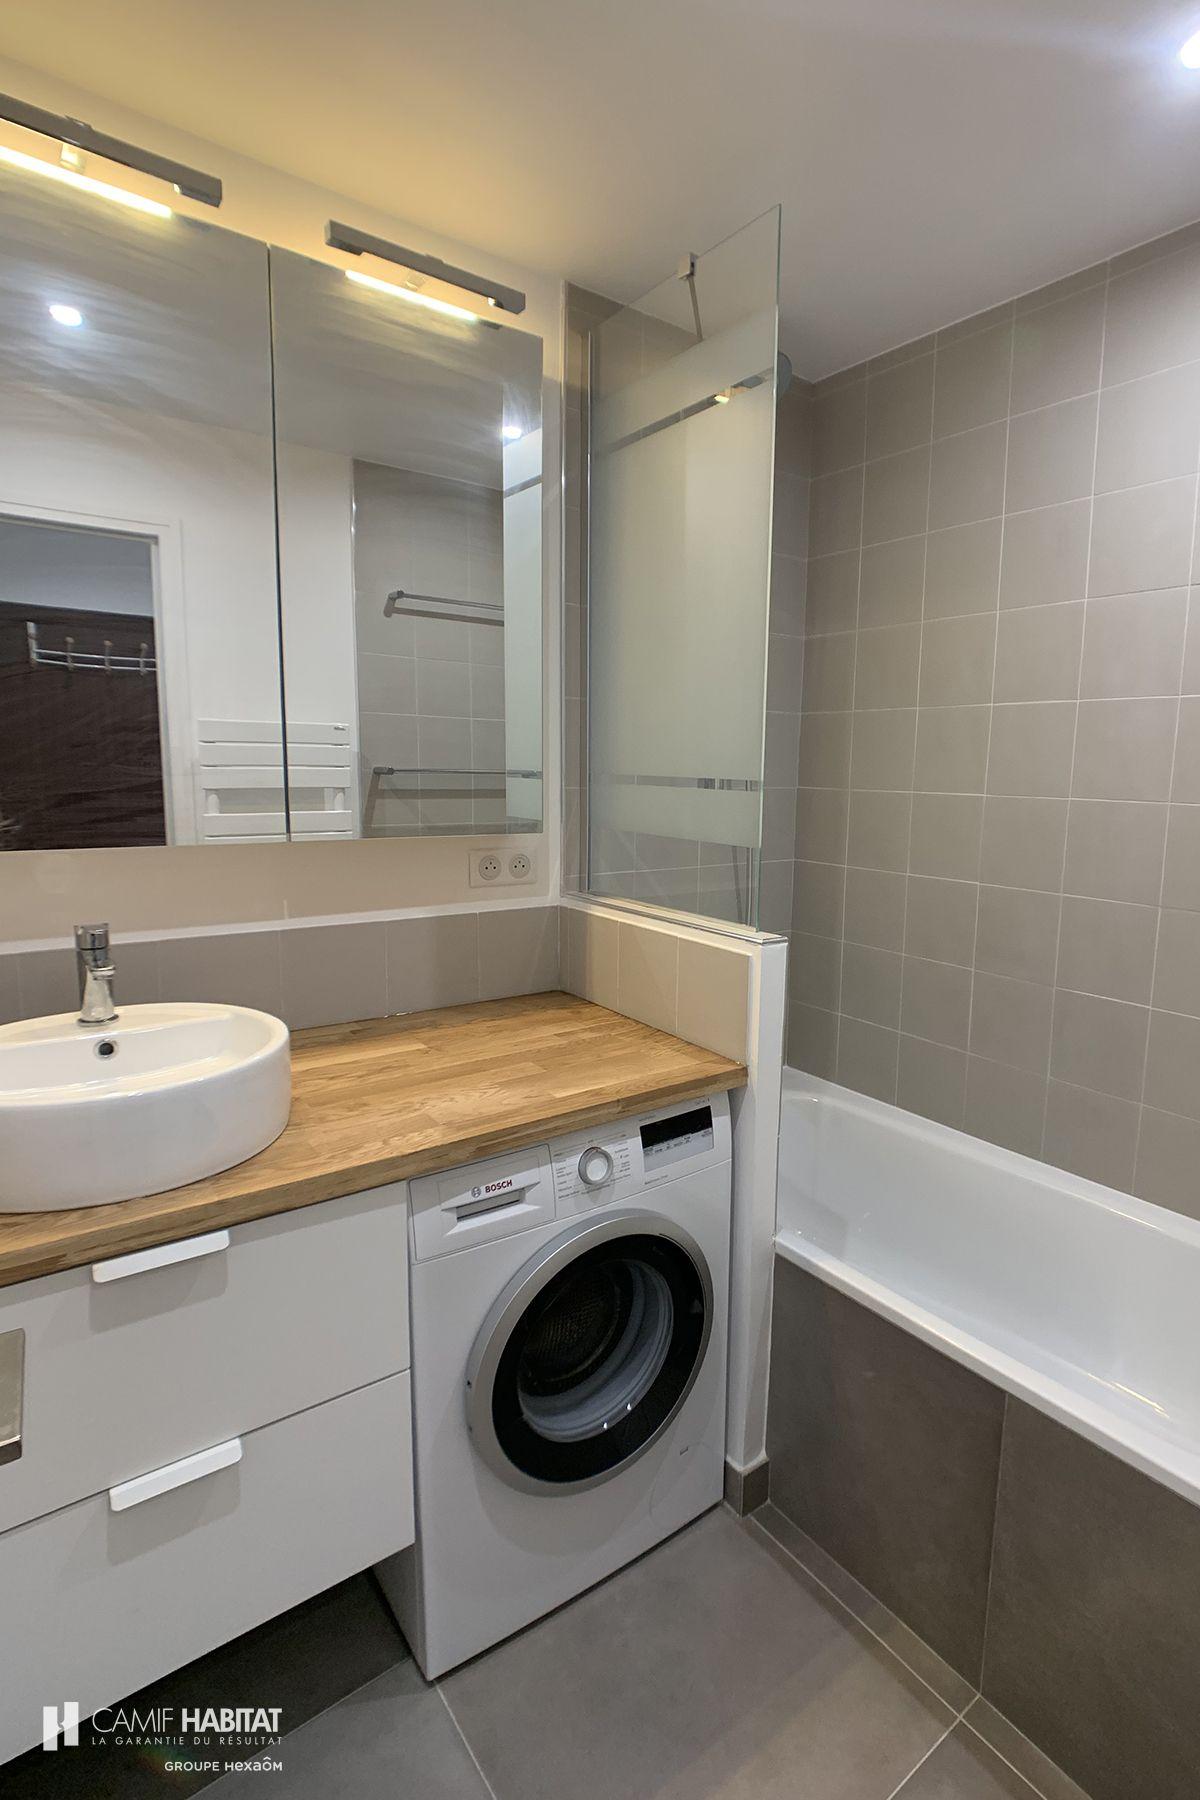 40++ Habitat salle de bain inspirations